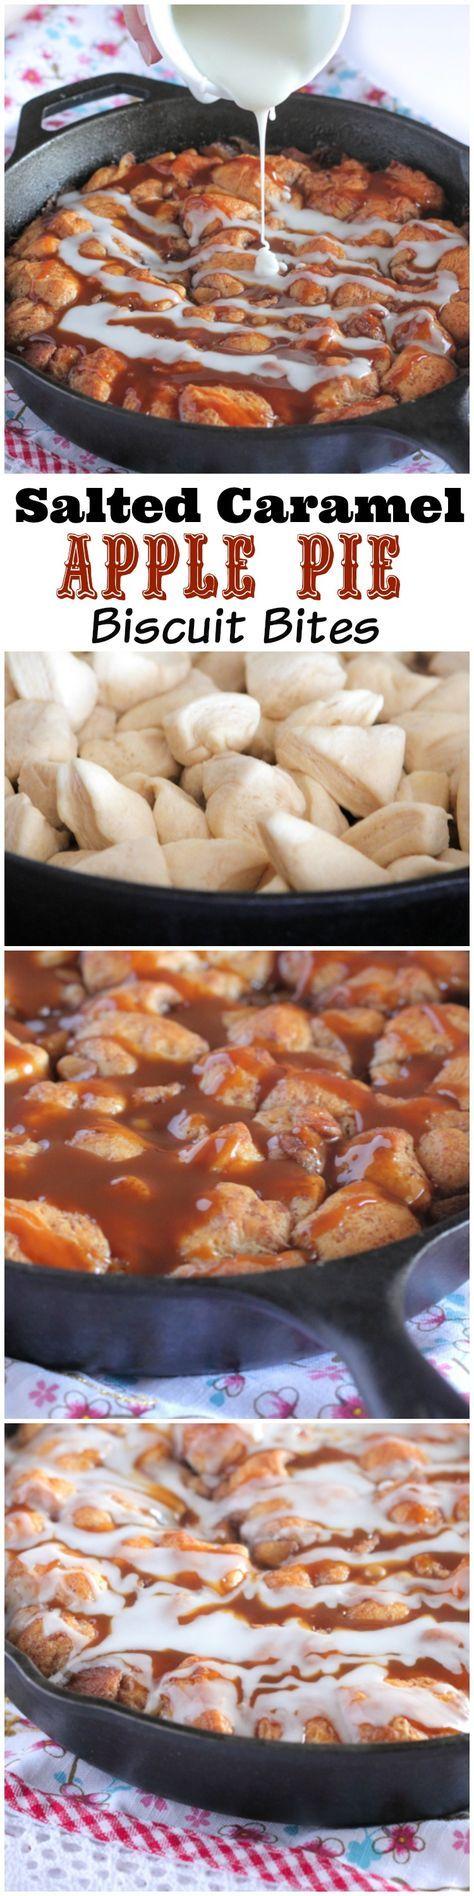 Salted Caramel Apple Pie Biscuit Bites... Dessert recipe to try.